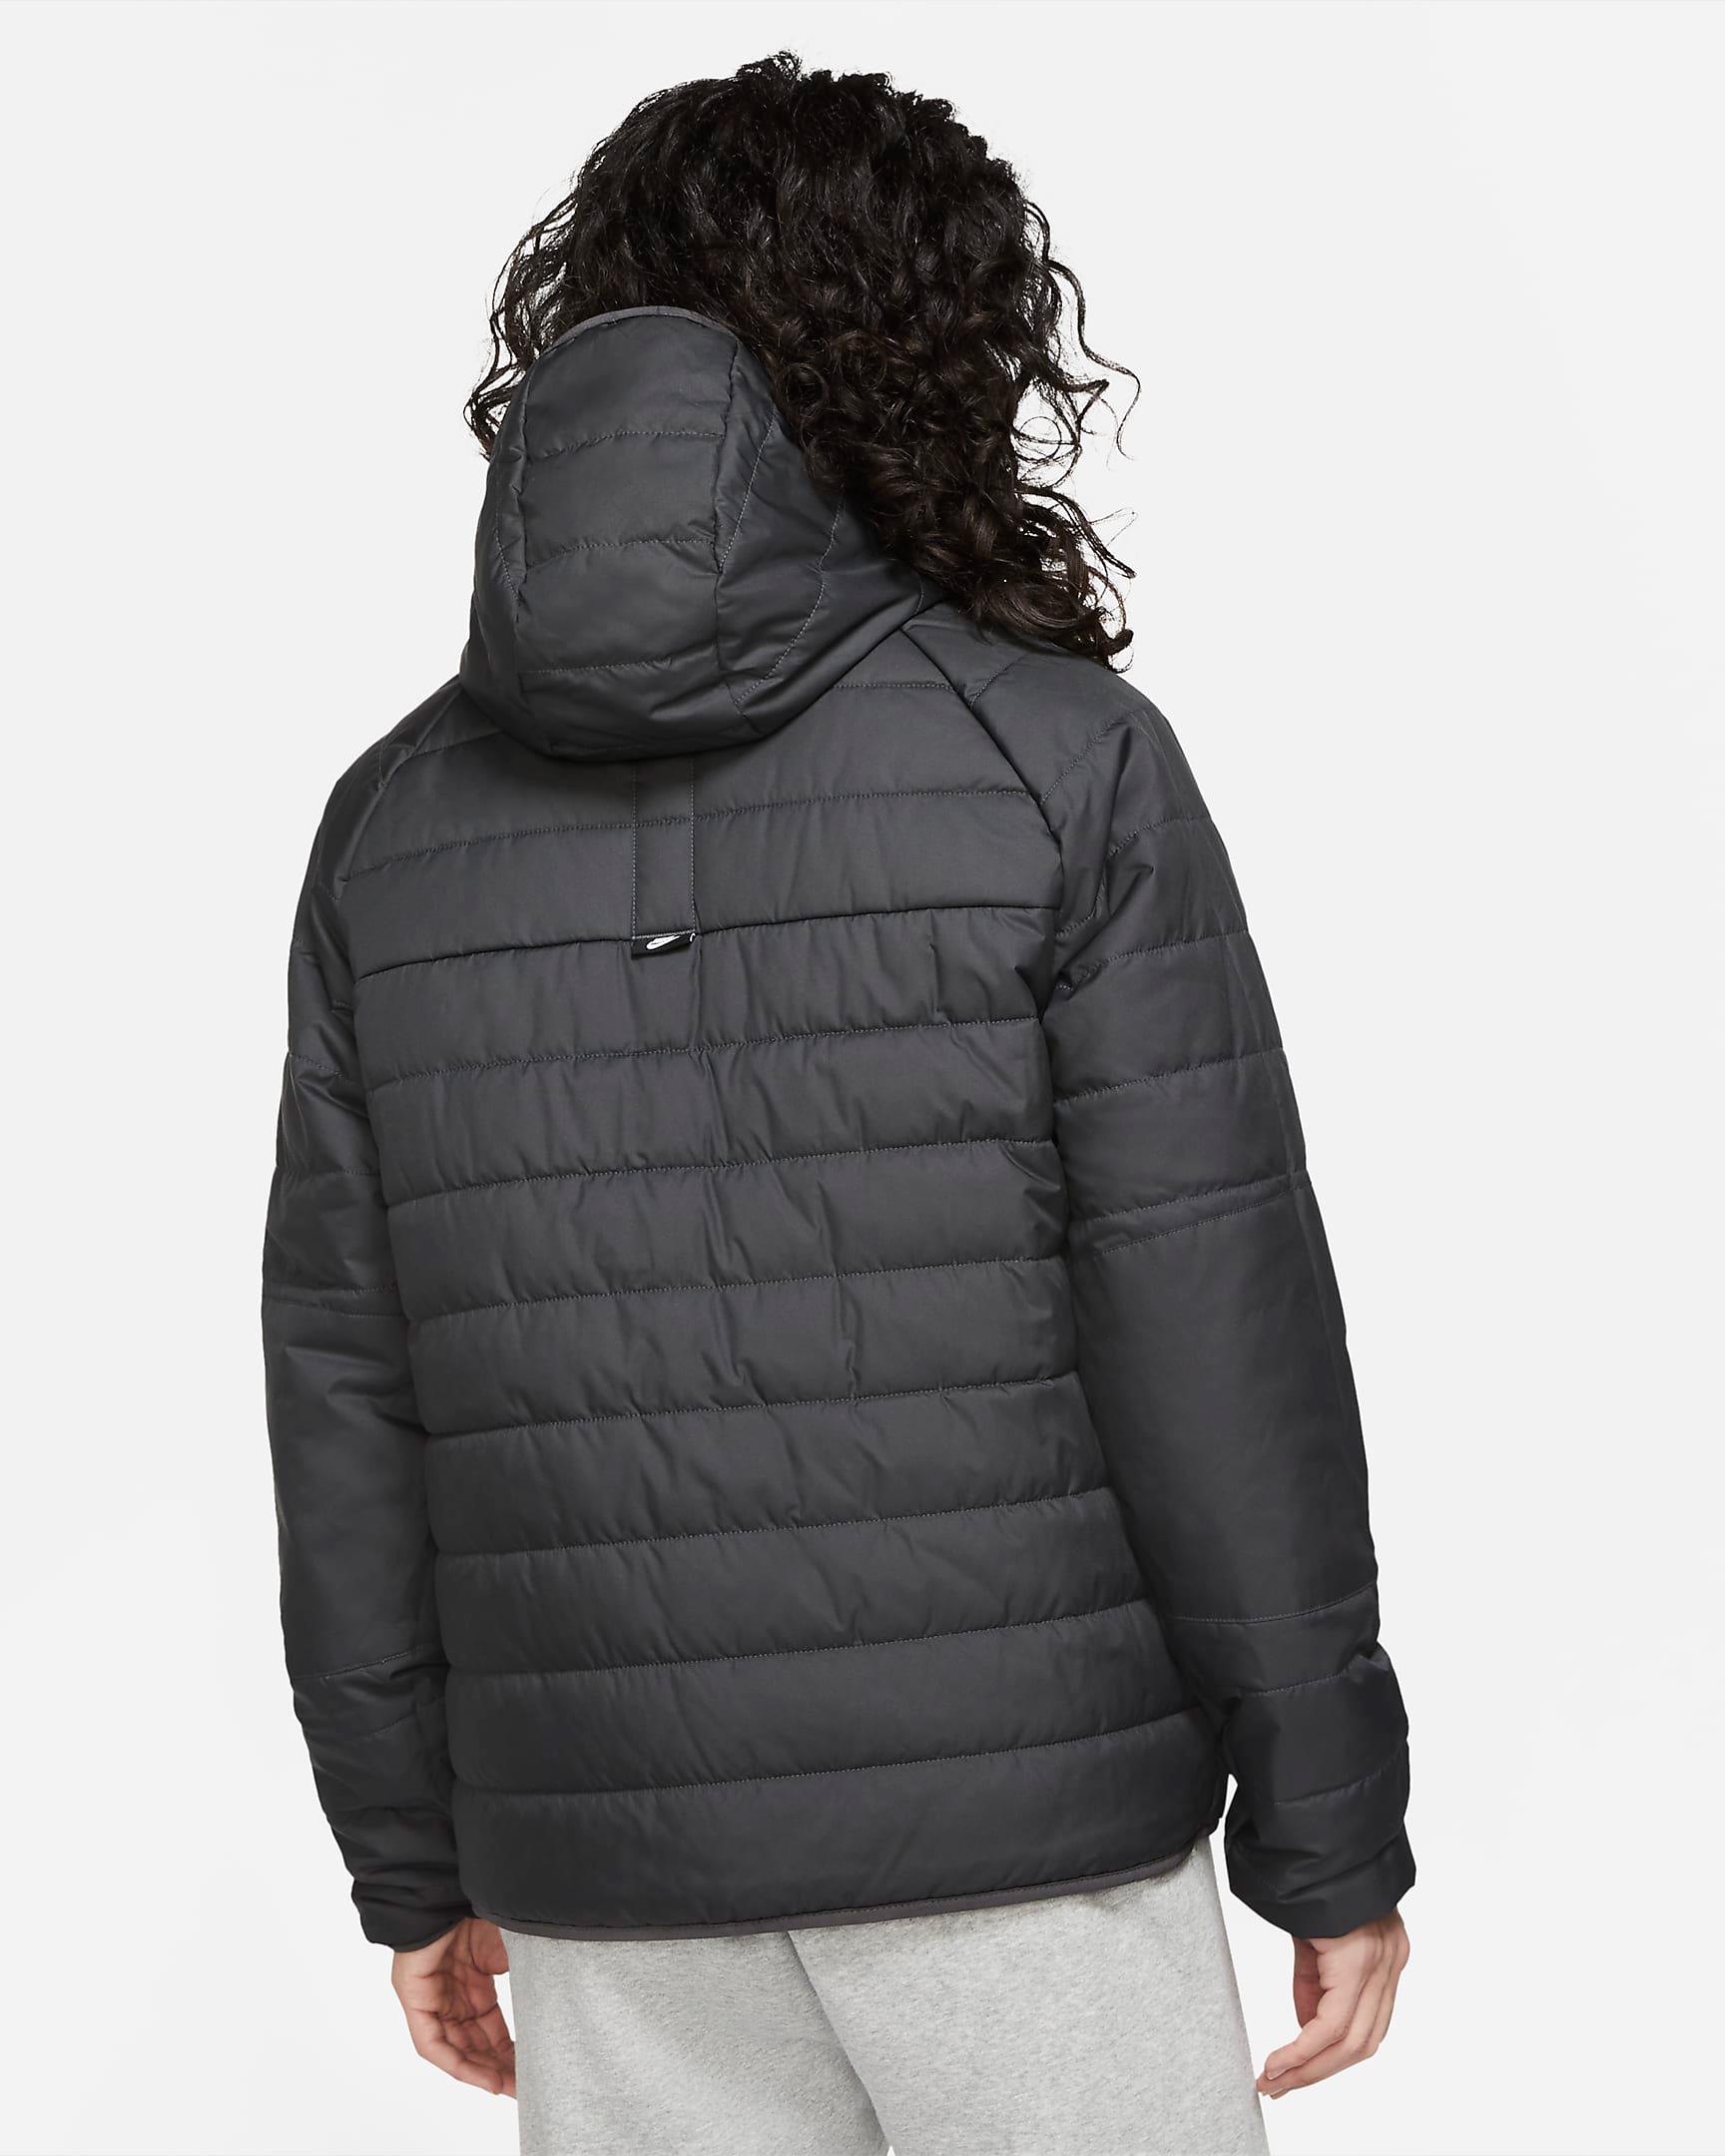 nike-sportswear-therma-fit-legacy-reversible-hooded-jacket-black-sail-4